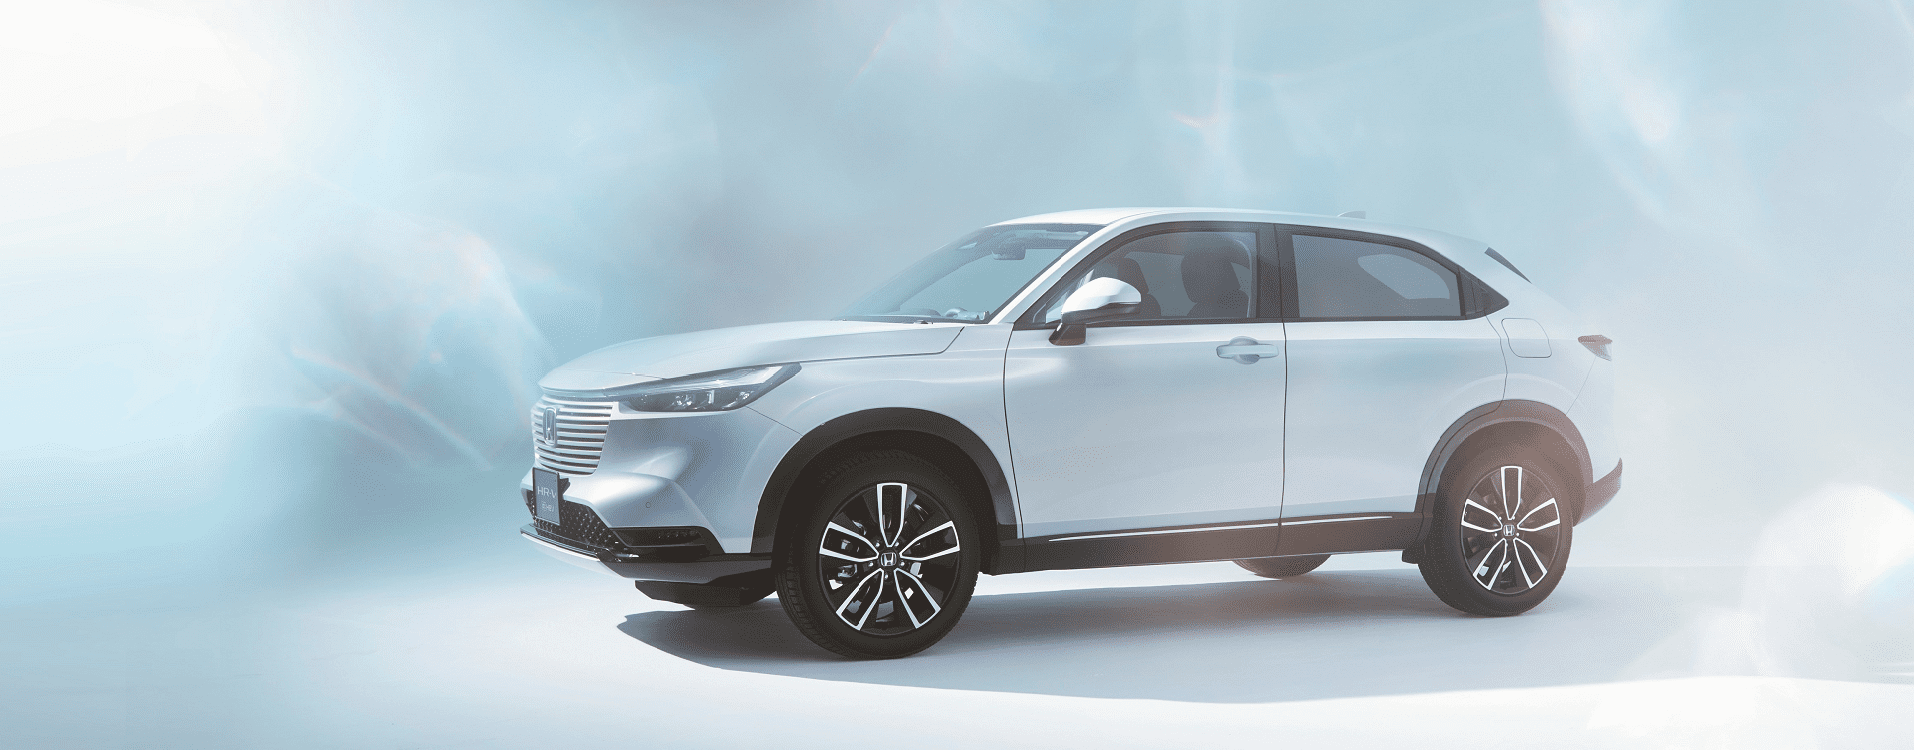 Honda introduceert de Nieuwe Honda HR-V